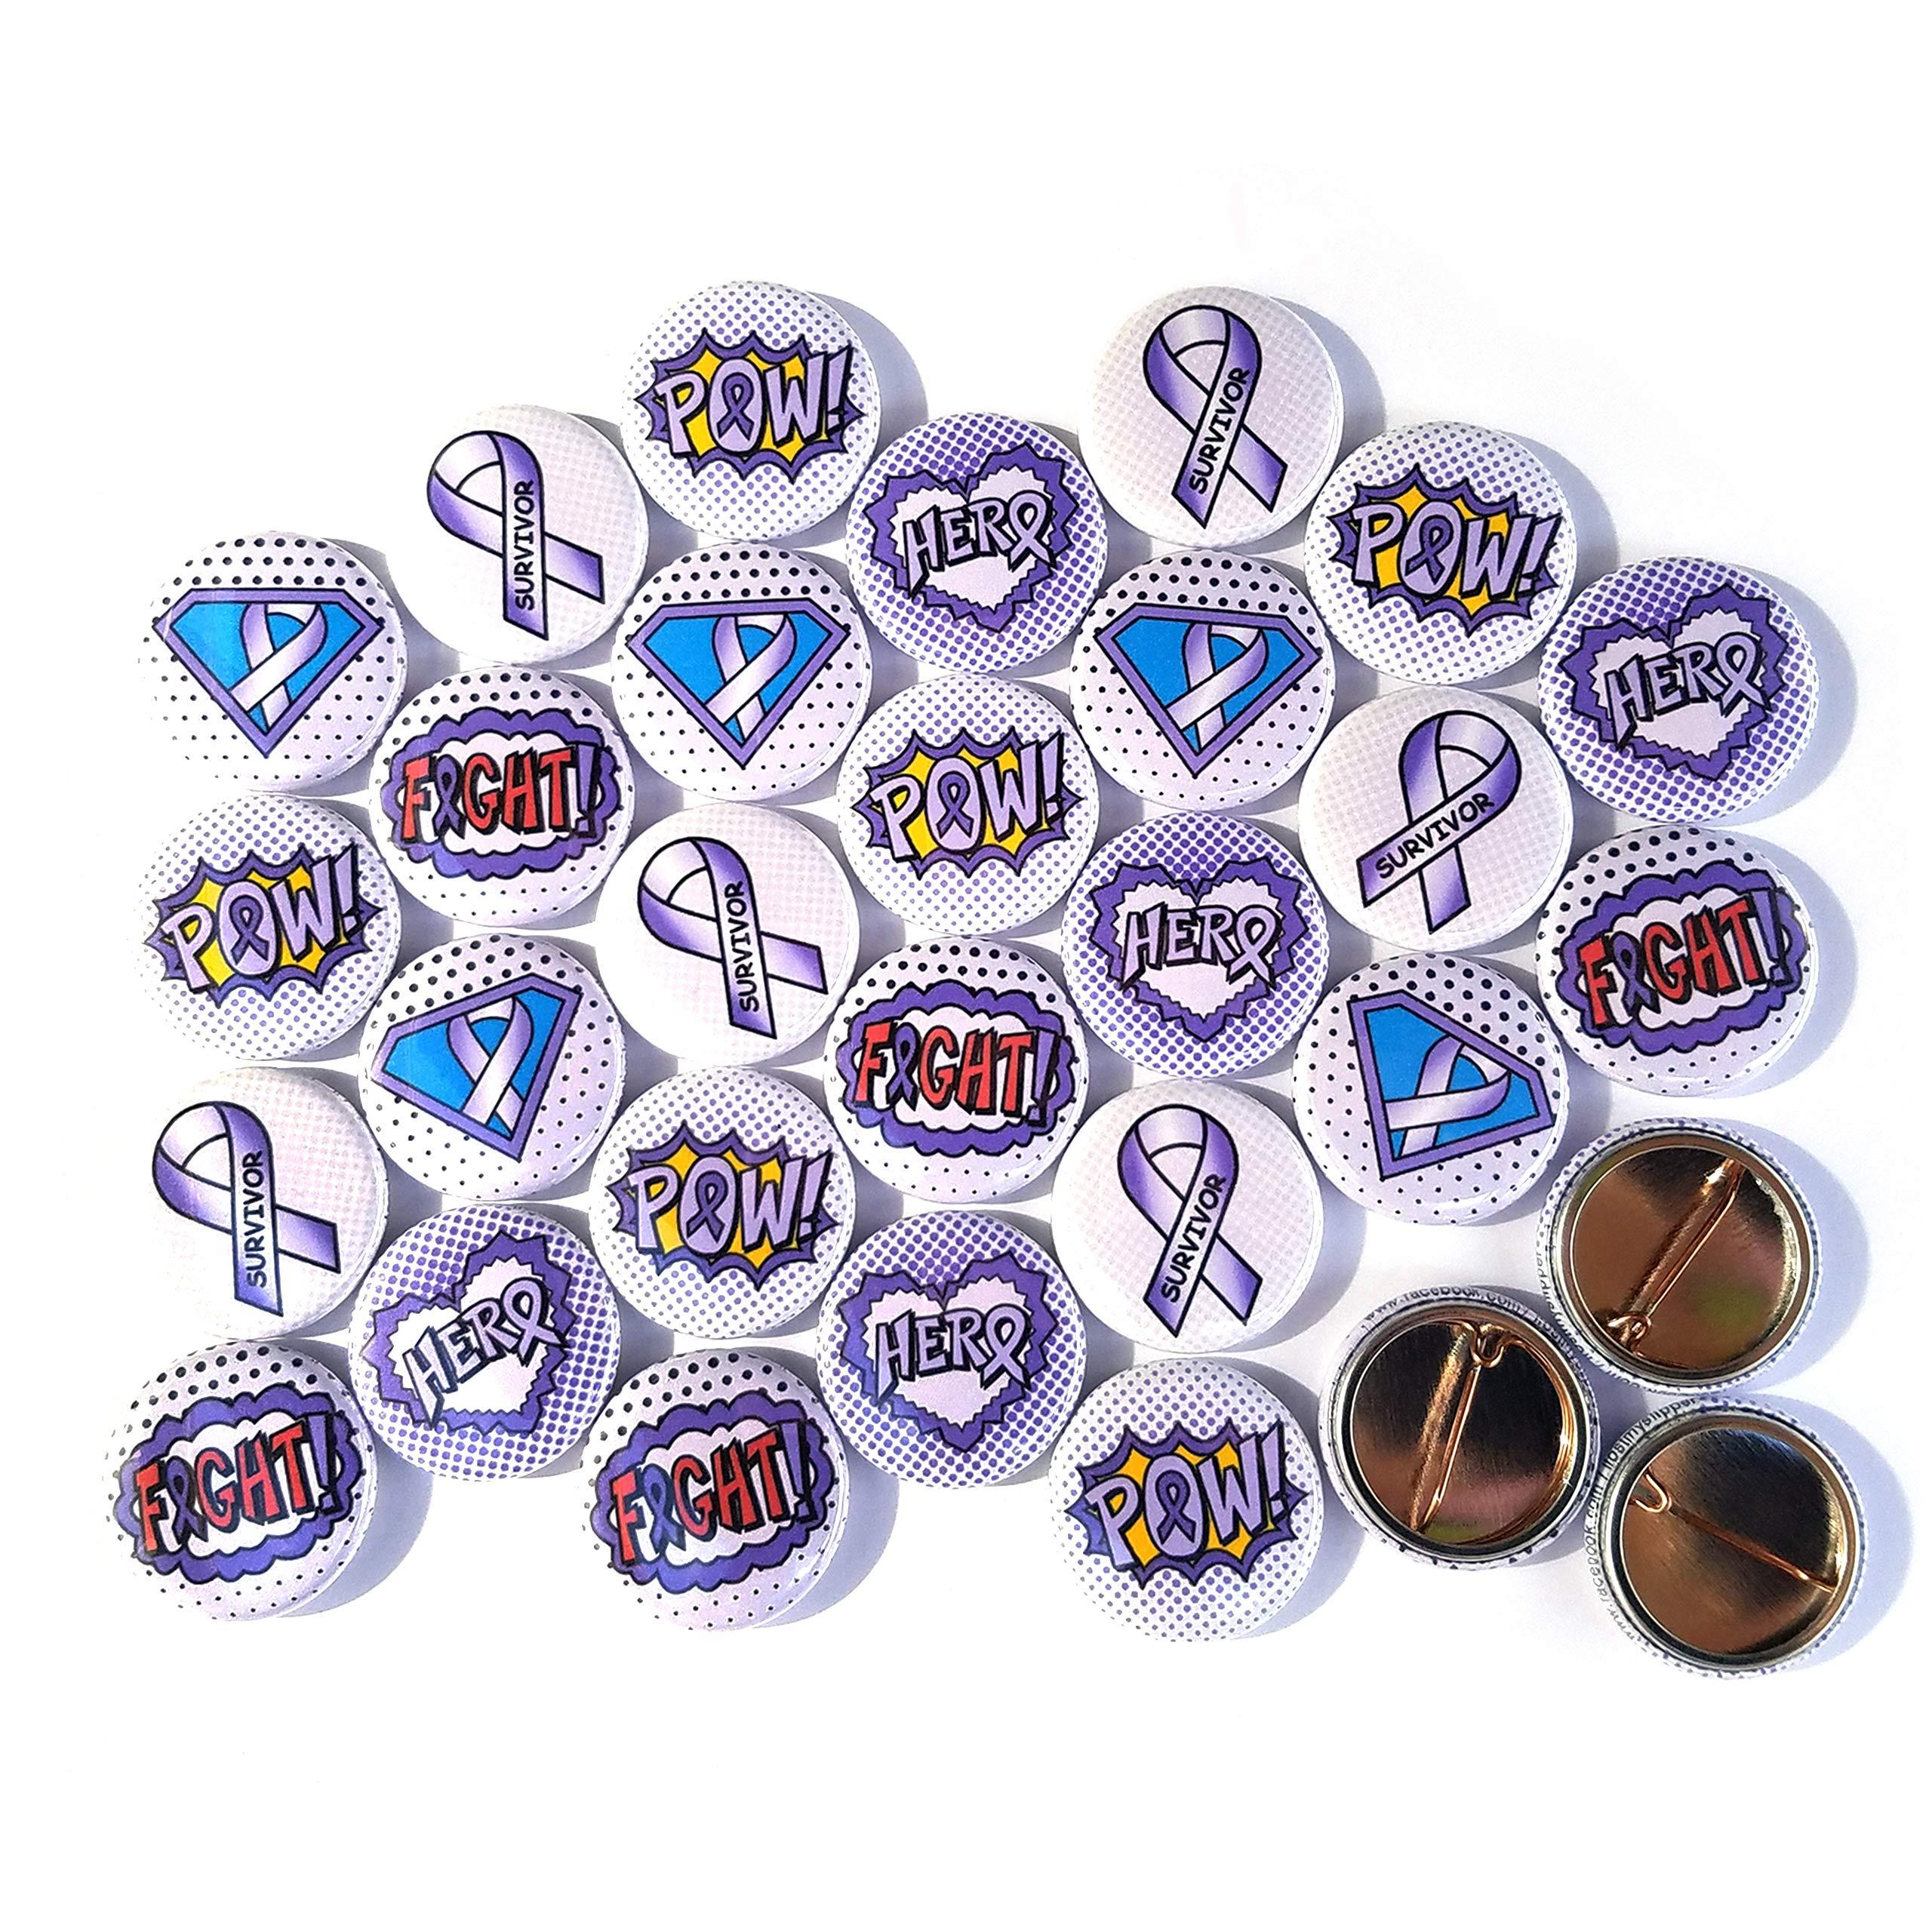 Superhero Awareness Pins - LAVENDER. All Cancer Awareness, Craniosynostosis, Epilepsy, Gynecological Cancer, Hypokalemic Periodic Paralysis, Infantile Spasms, Rett Syndrome. (1'' Pins, 30 Piece Set)